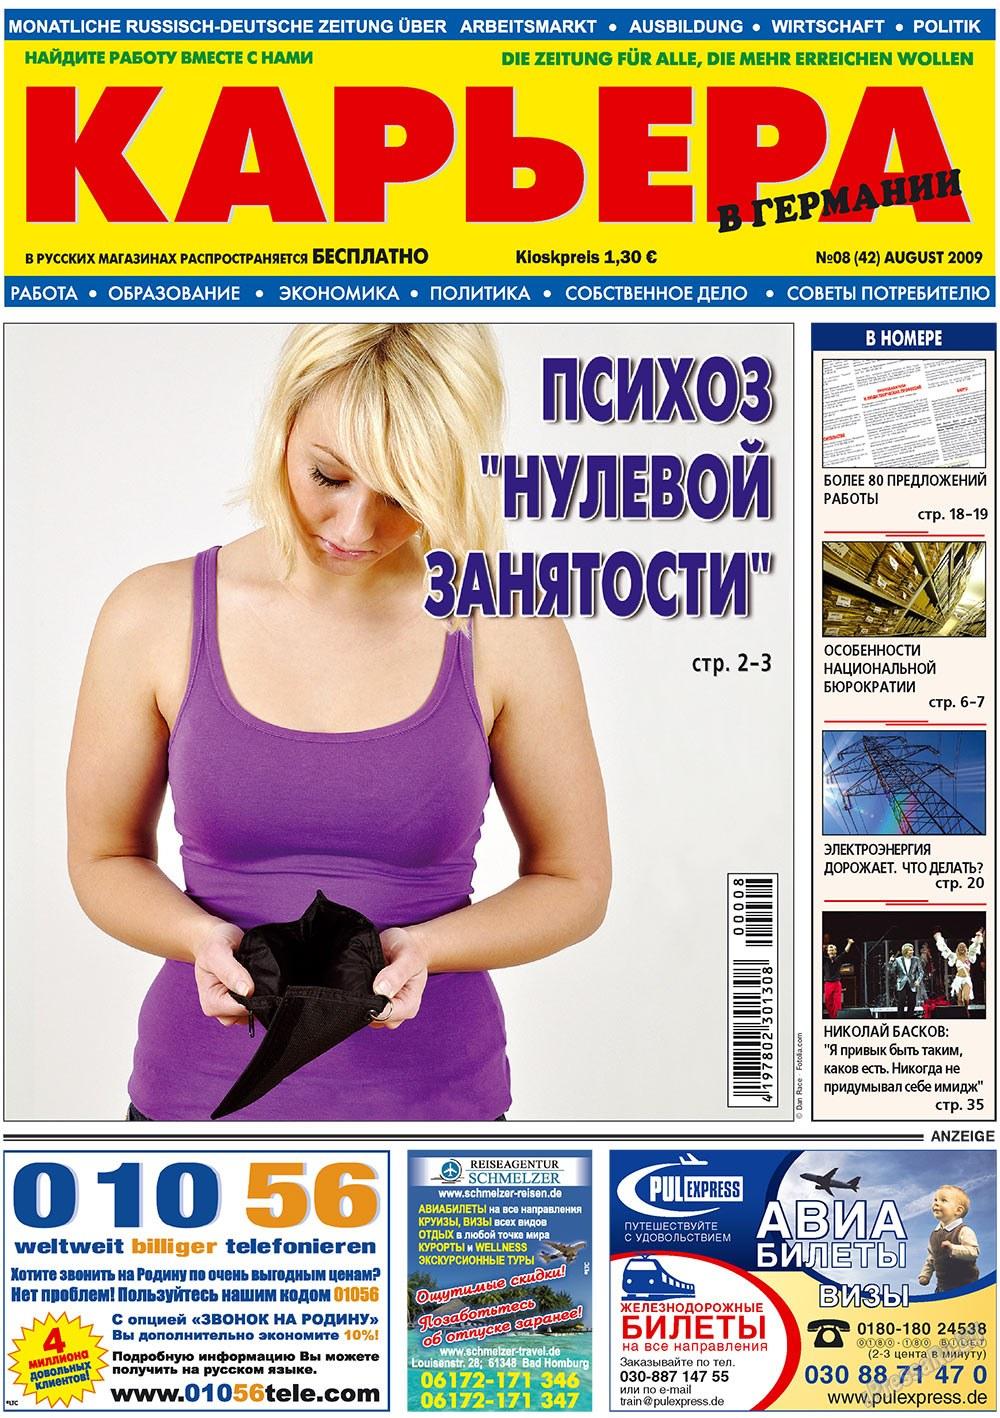 Карьера (газета). 2009 год, номер 8, стр. 1